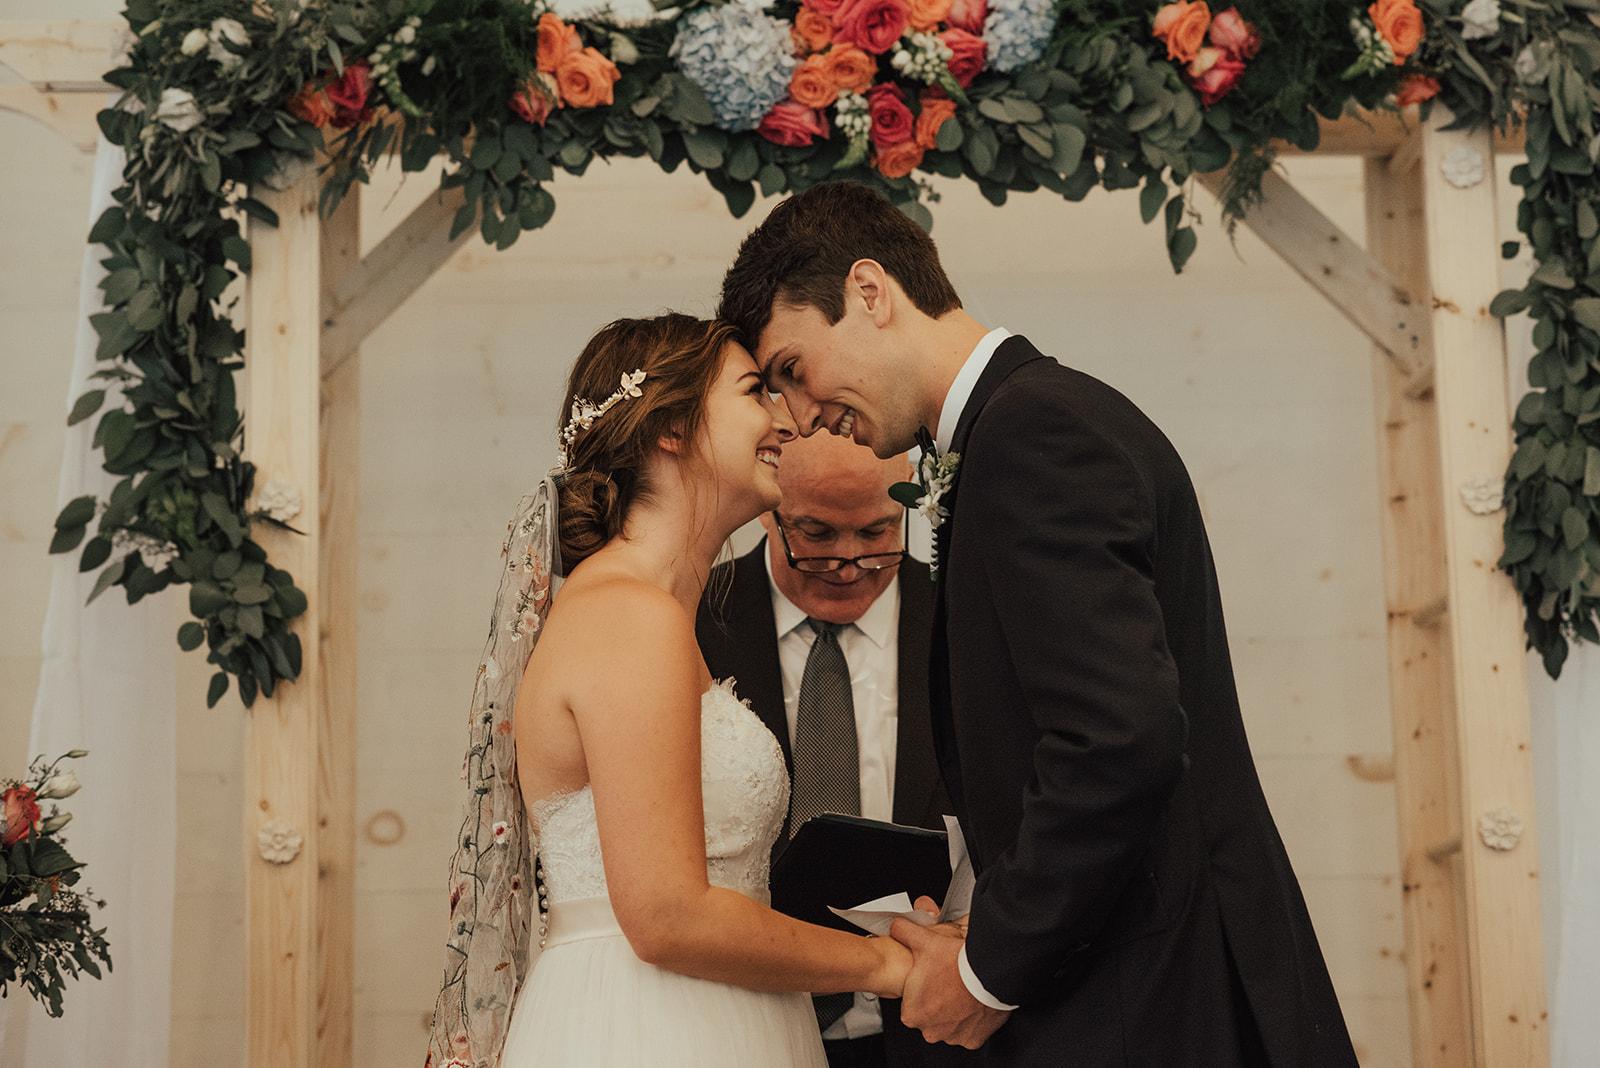 Richmond VA Wedding By SB Photographs180180.jpg